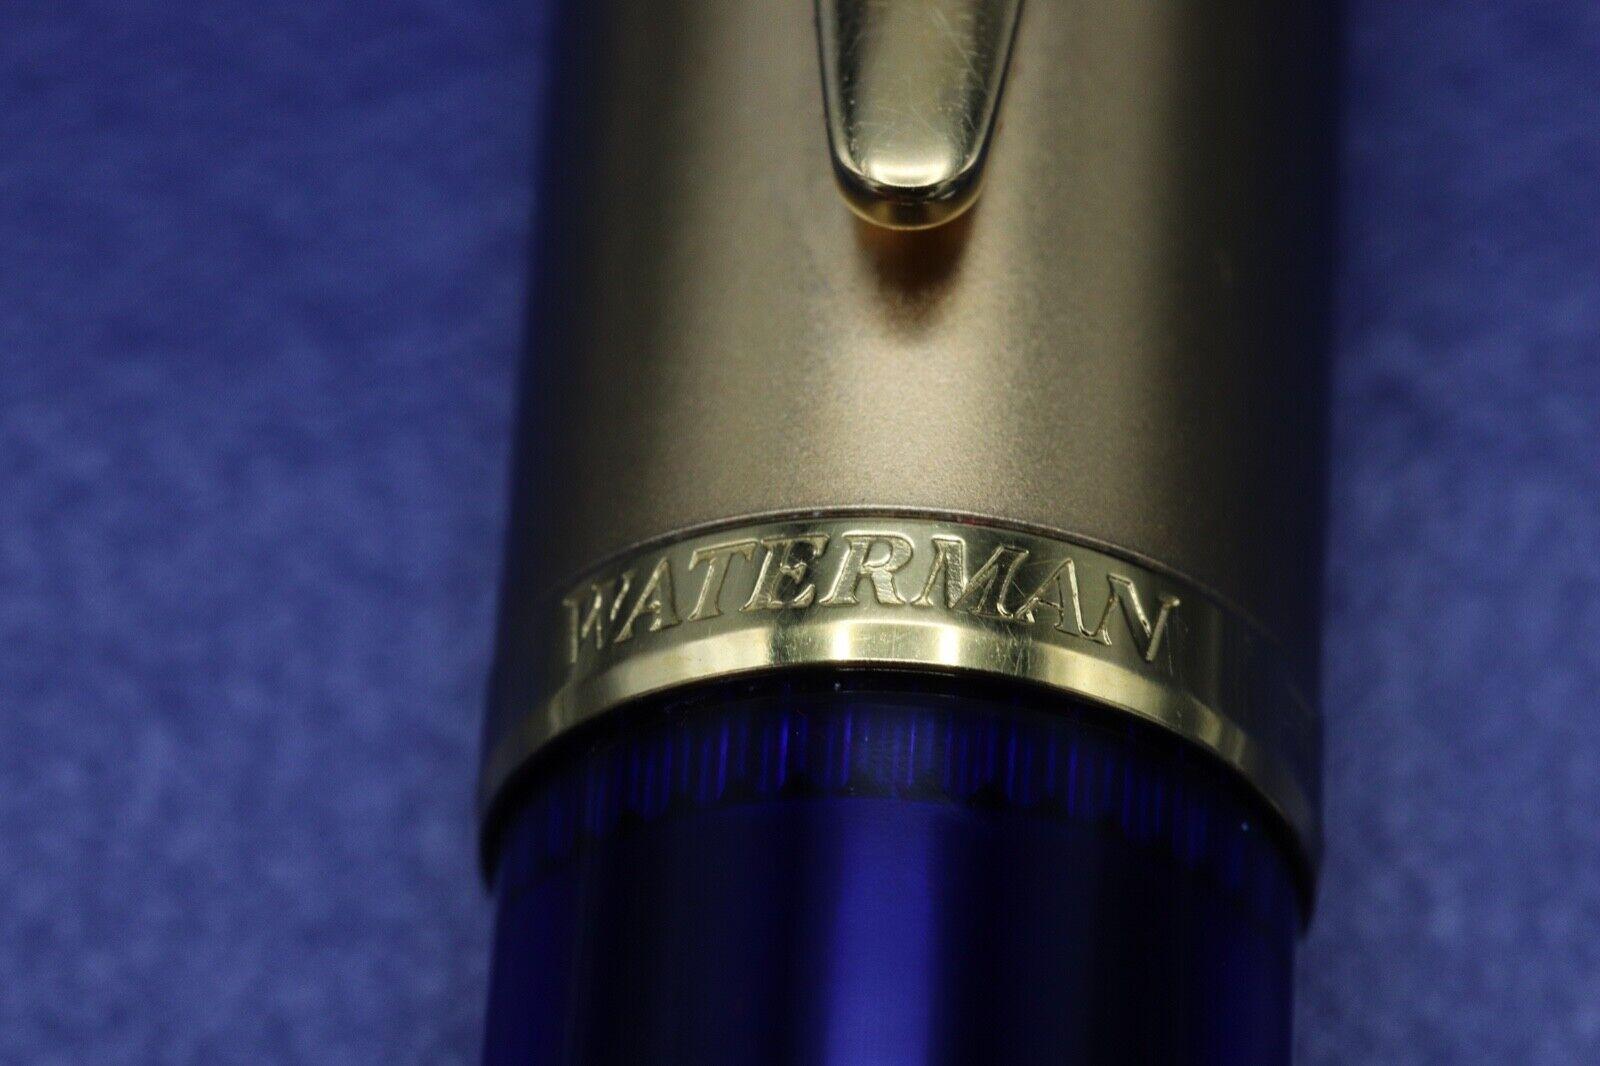 Waterman Edson Sapphire Blue Ballpoint Pen 2